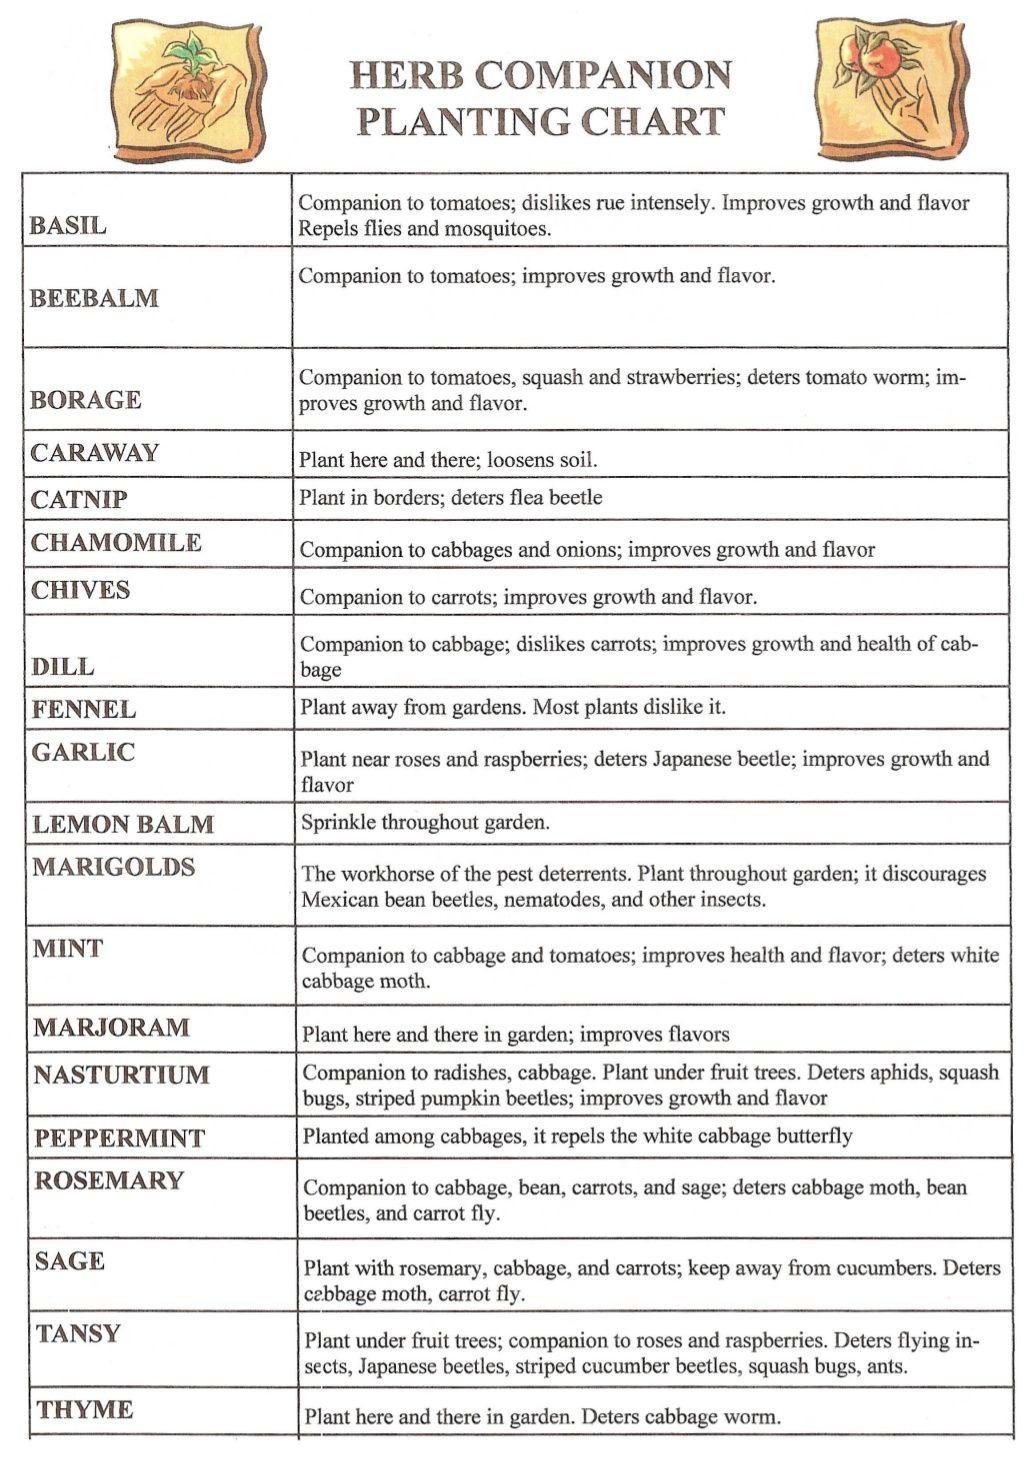 Herb Companion Planting Chart Herbal Gardens 15550890 By Fawn85w Via Slideshare